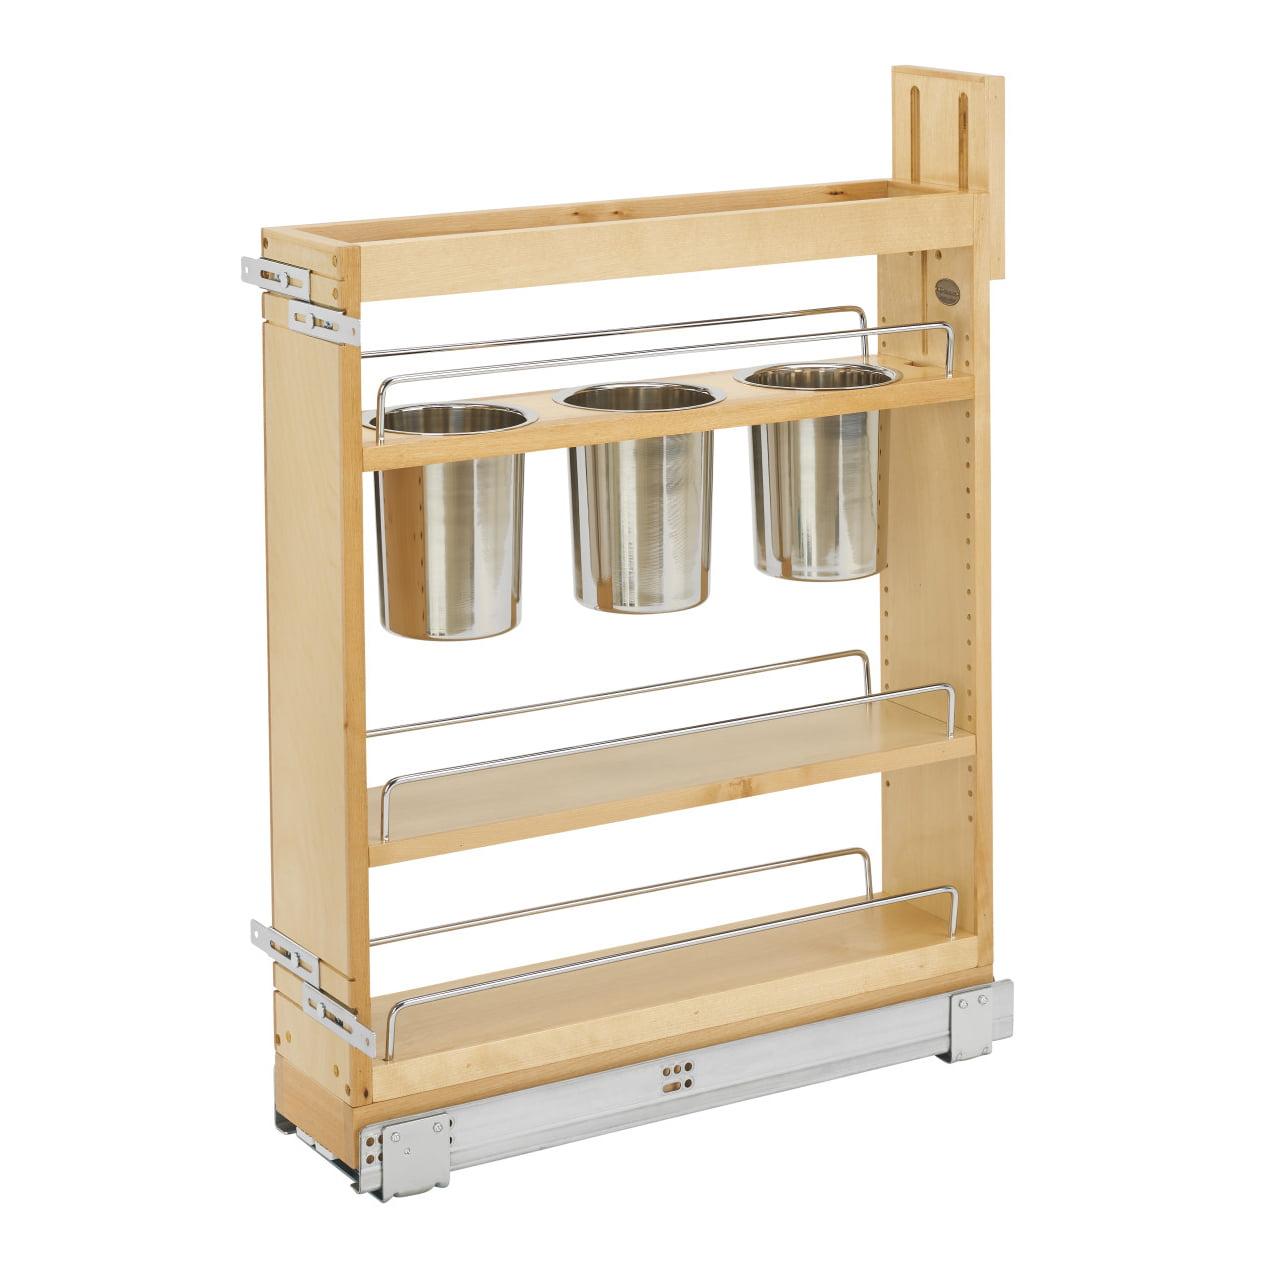 1 Pcs freezer//fridge thermometer for food storage temperature measurement BS/&T